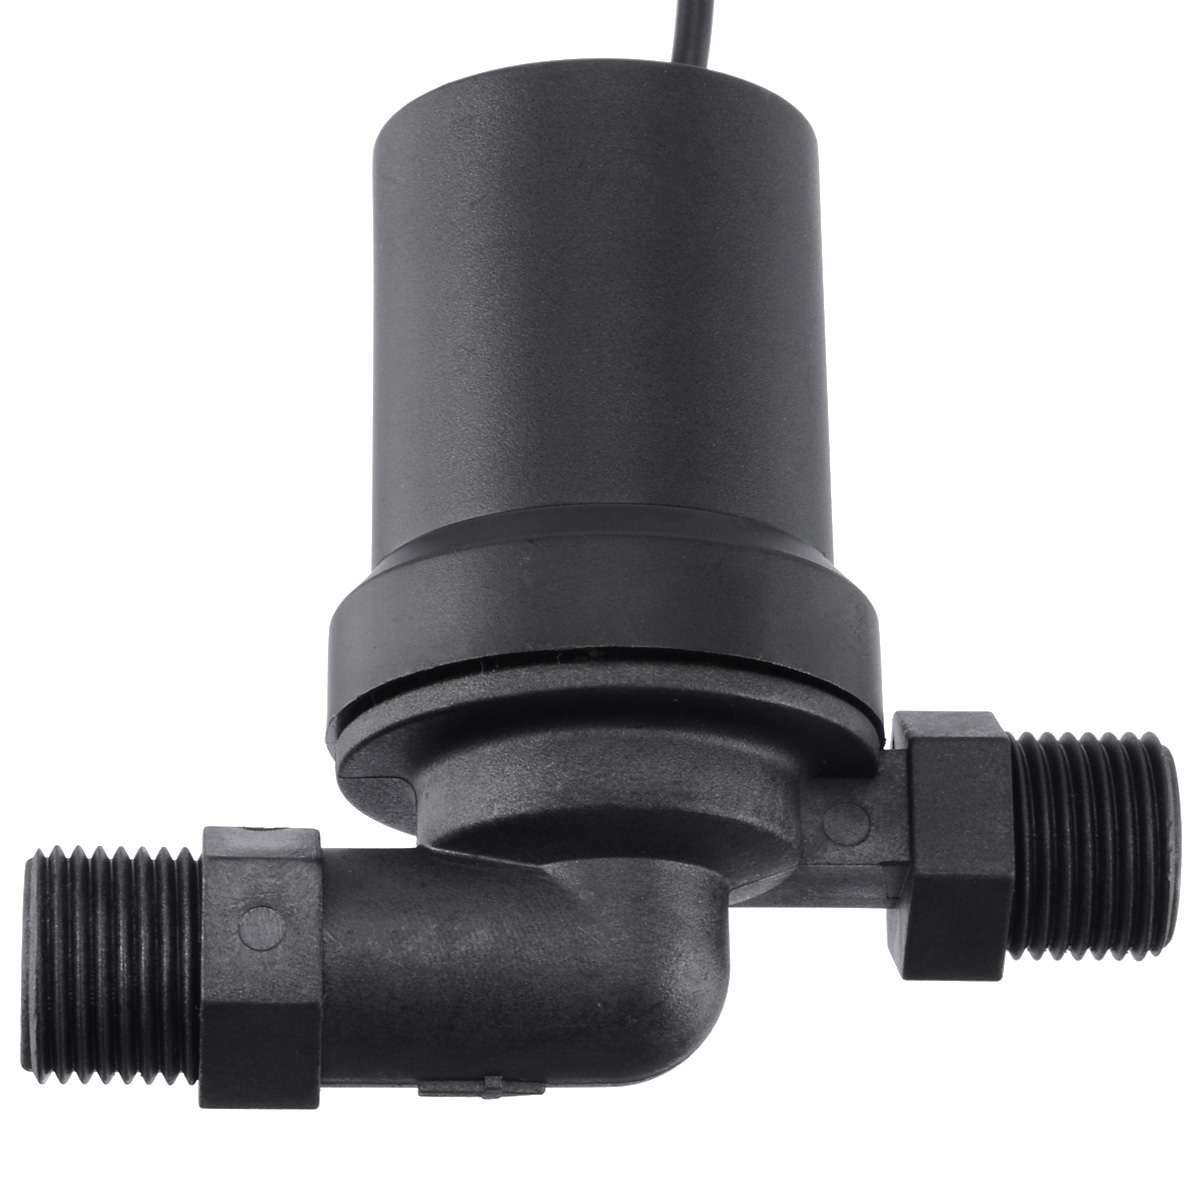 DC12V 650L/H Hot Water Circulation Pump Durable Brushless Motor Micro High Pressure Diaphragm Water Pumps